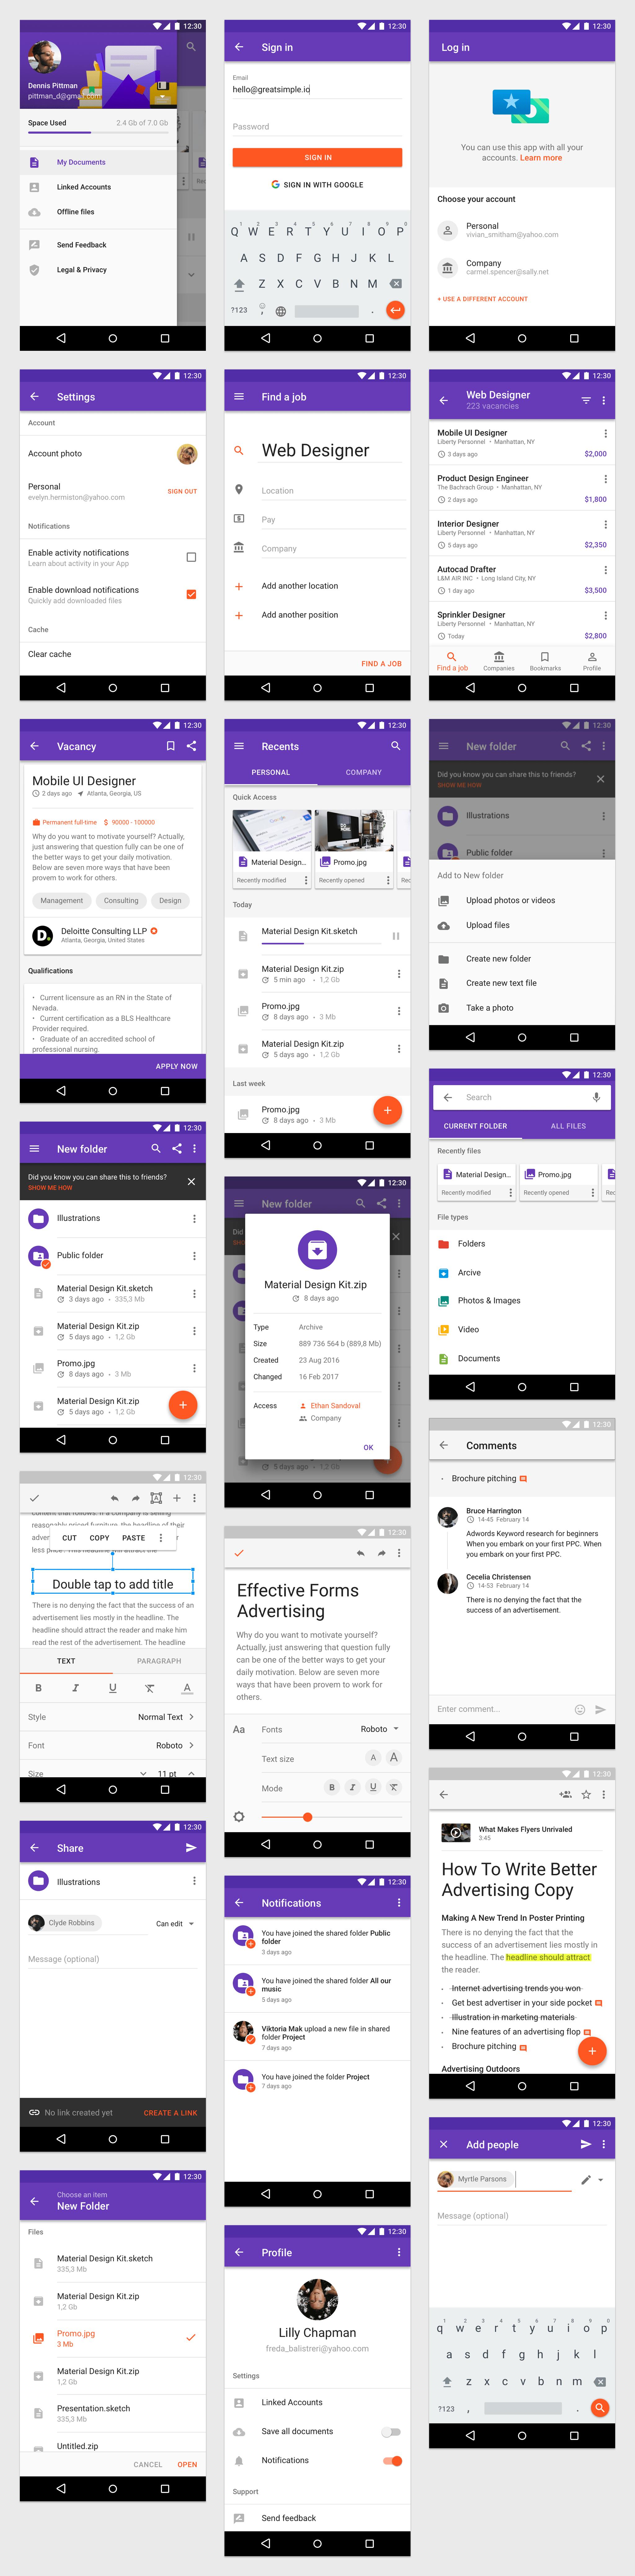 Material Design Kit - App Templates